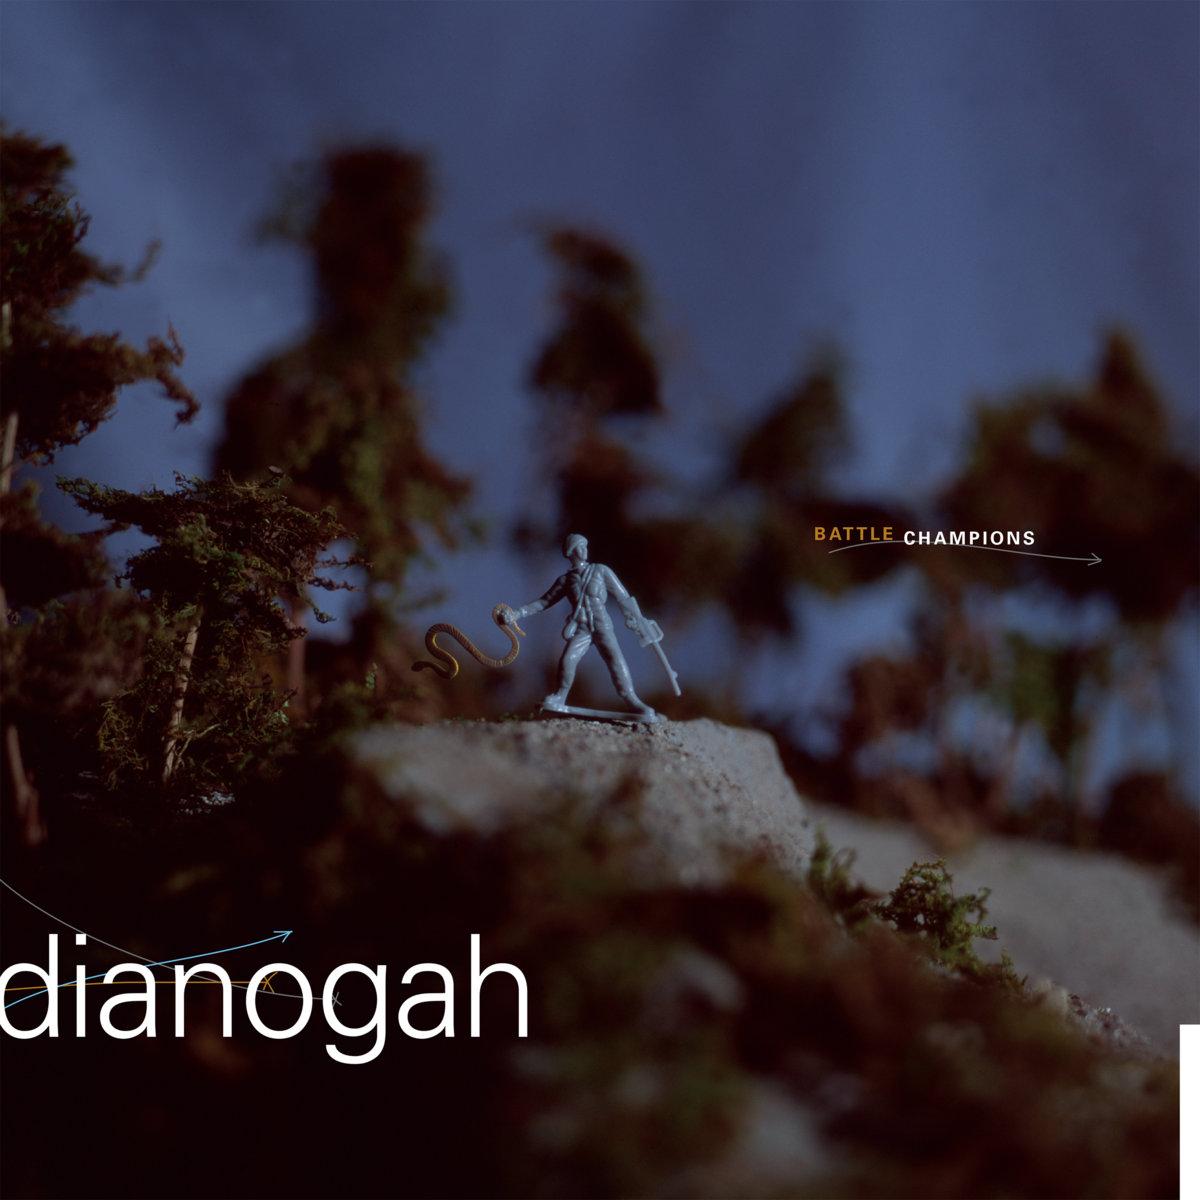 dianogah  – battle champions [2000] / whitneyhubbs